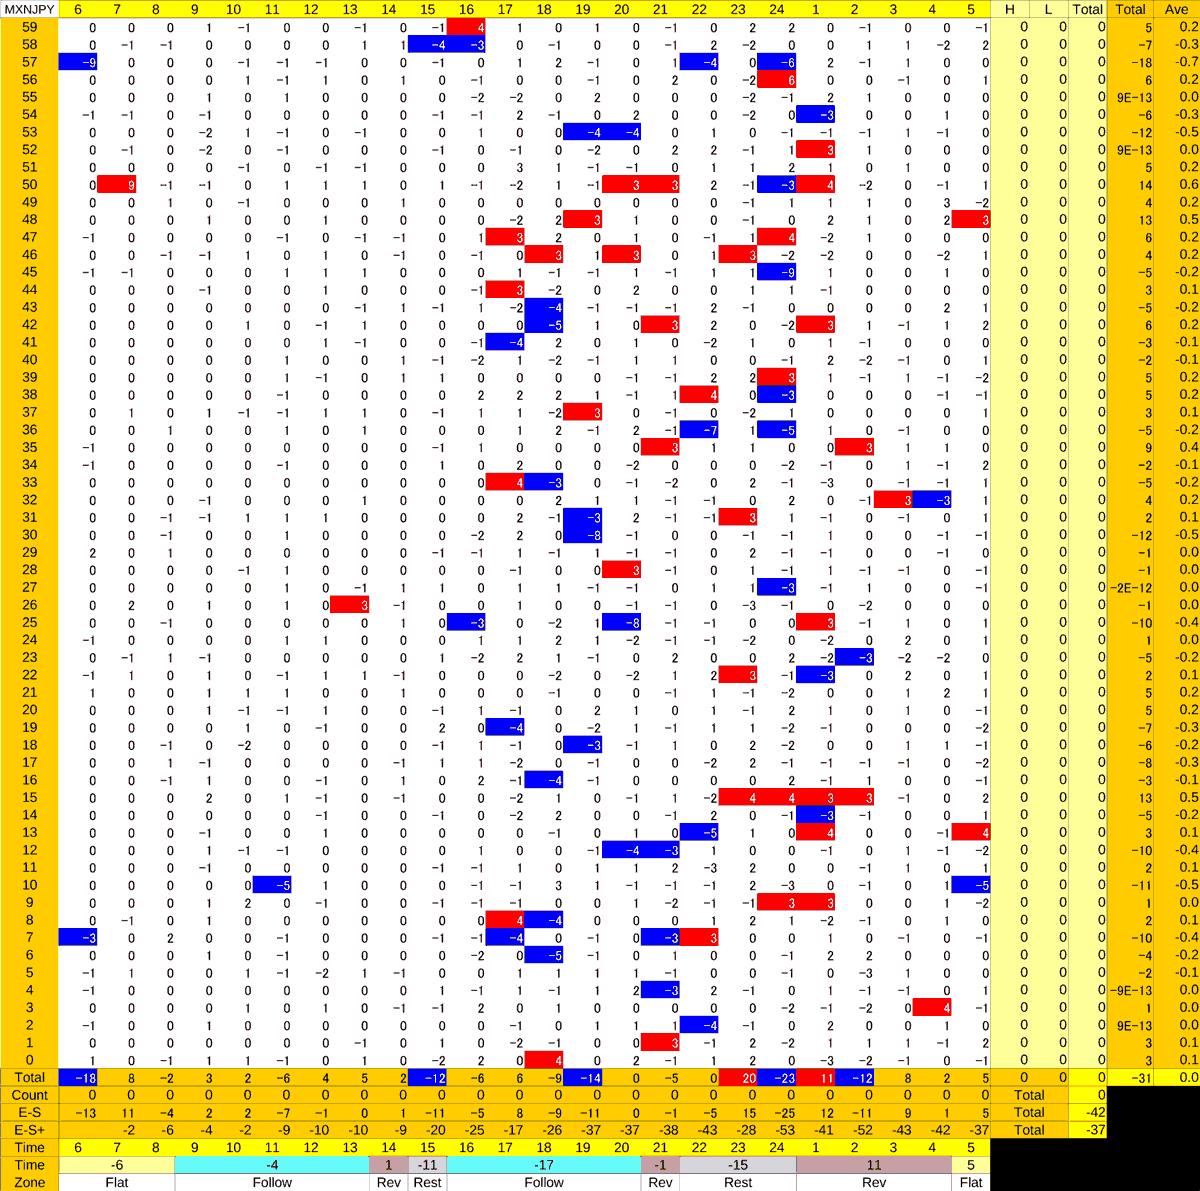 20210122_HS(3)MXNJPY